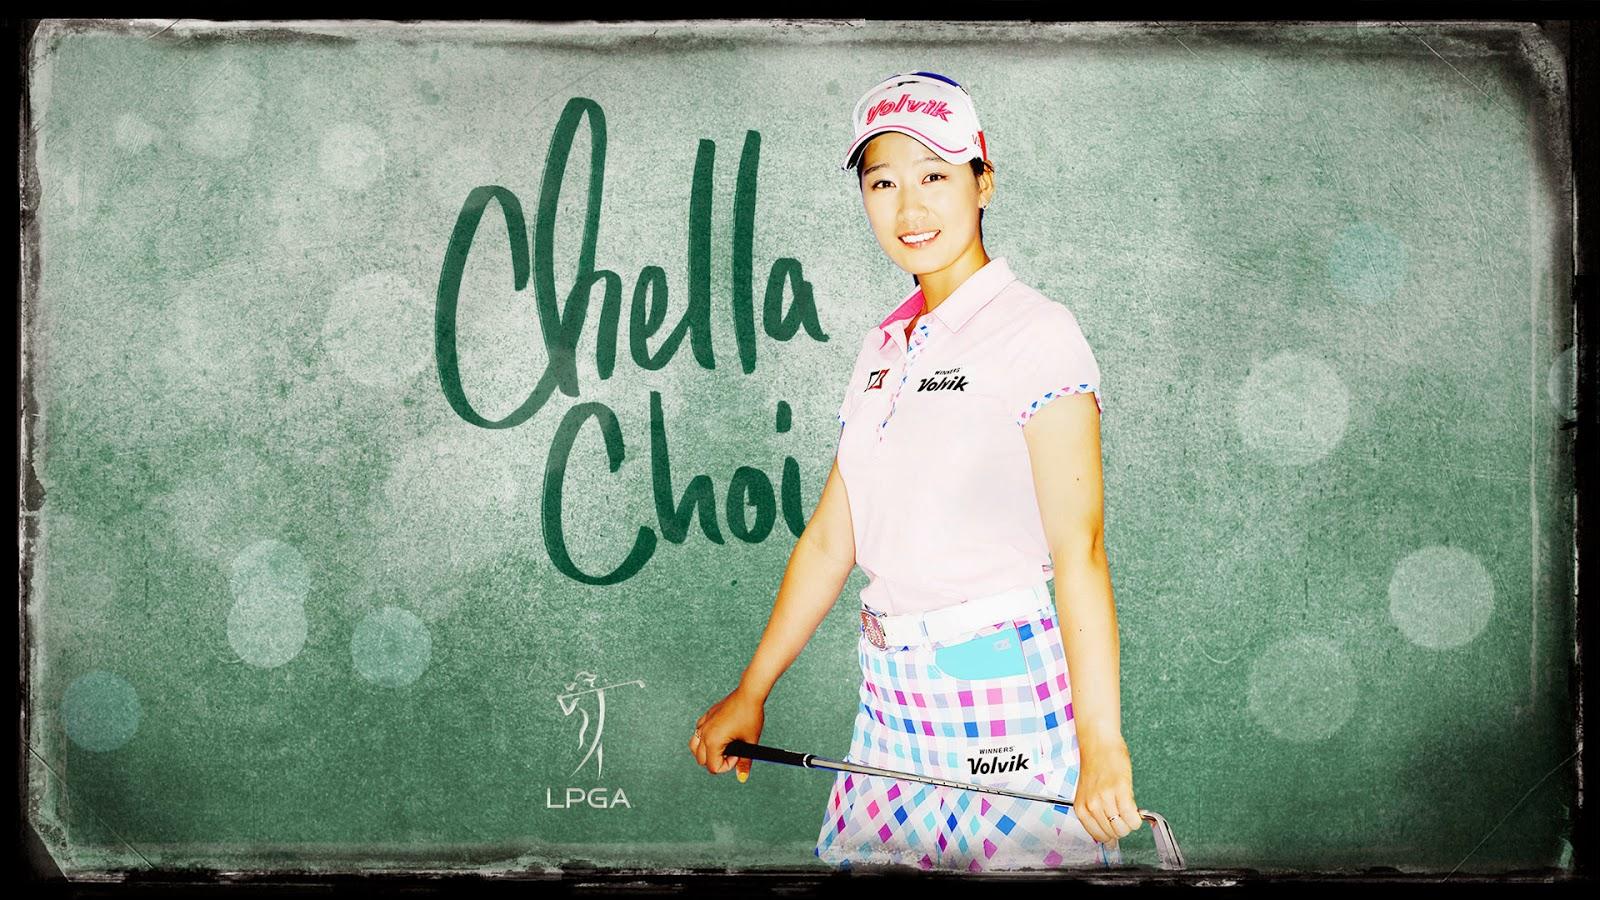 Chella-Choi-LPGA-Wallpaper-2014